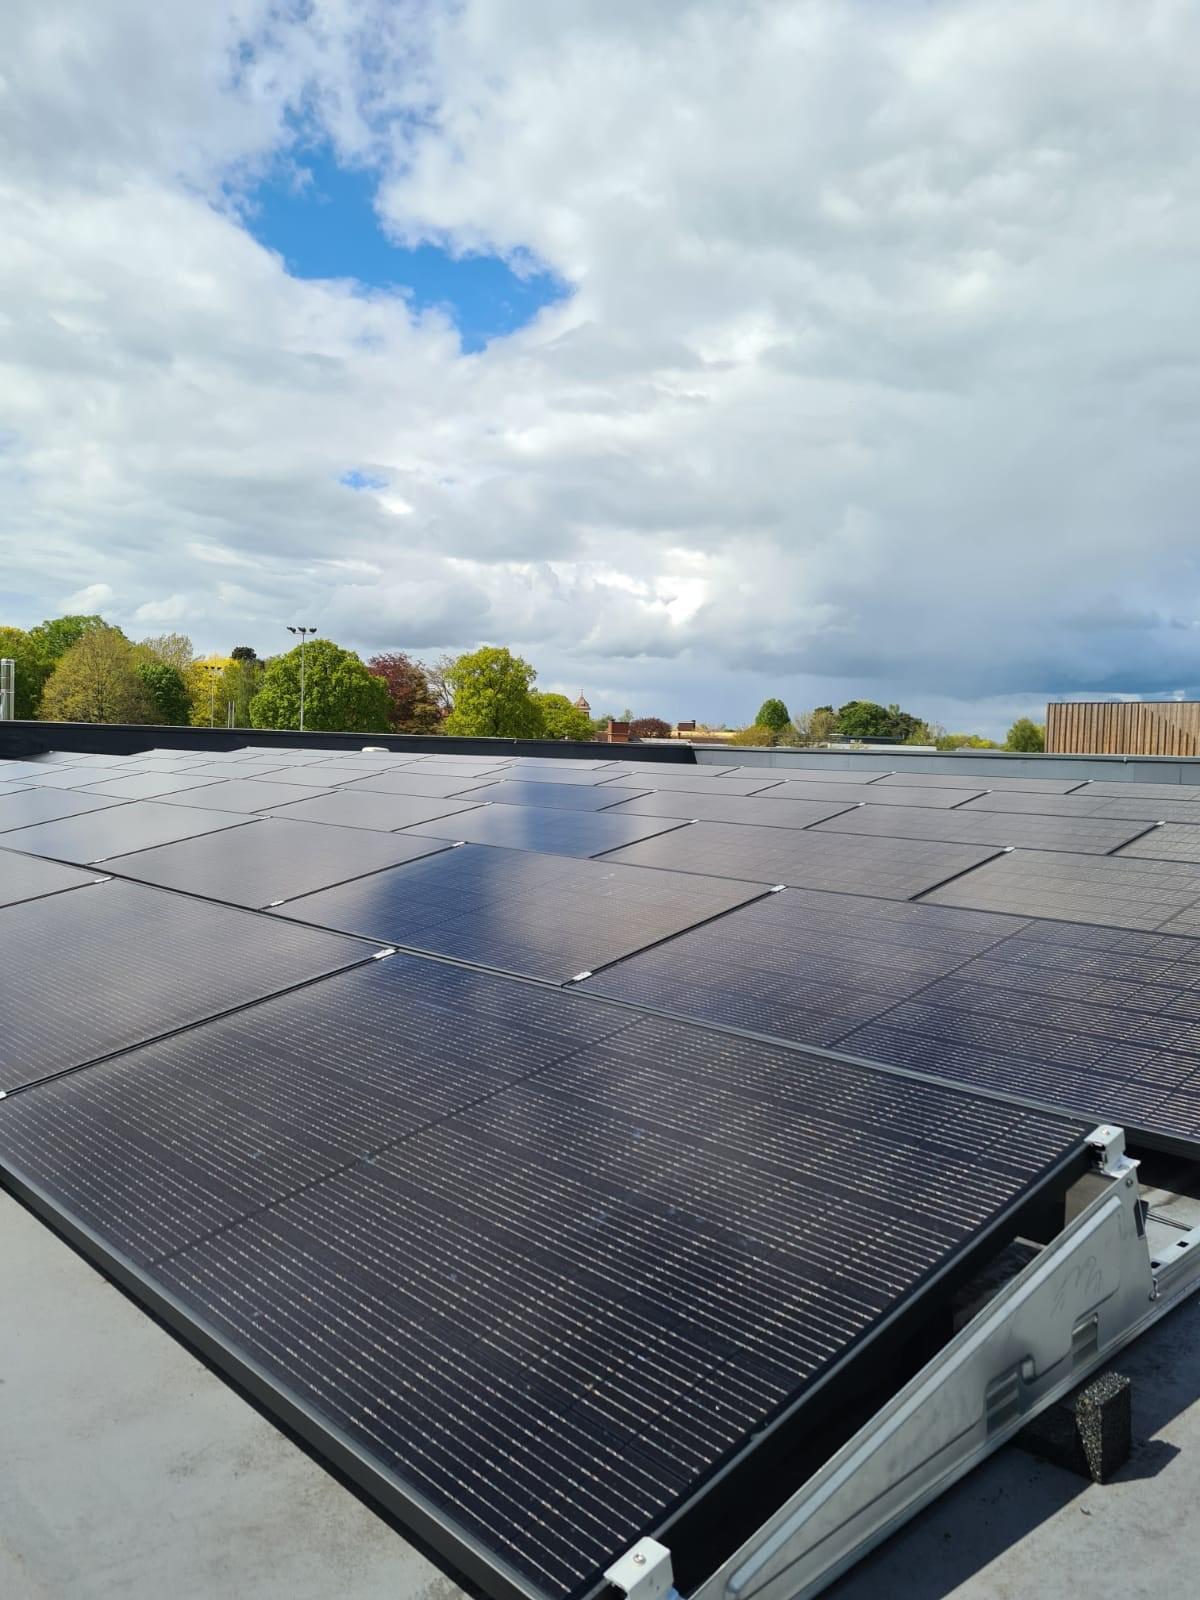 Reaseheath Vertical Farm Supported by Solar Power